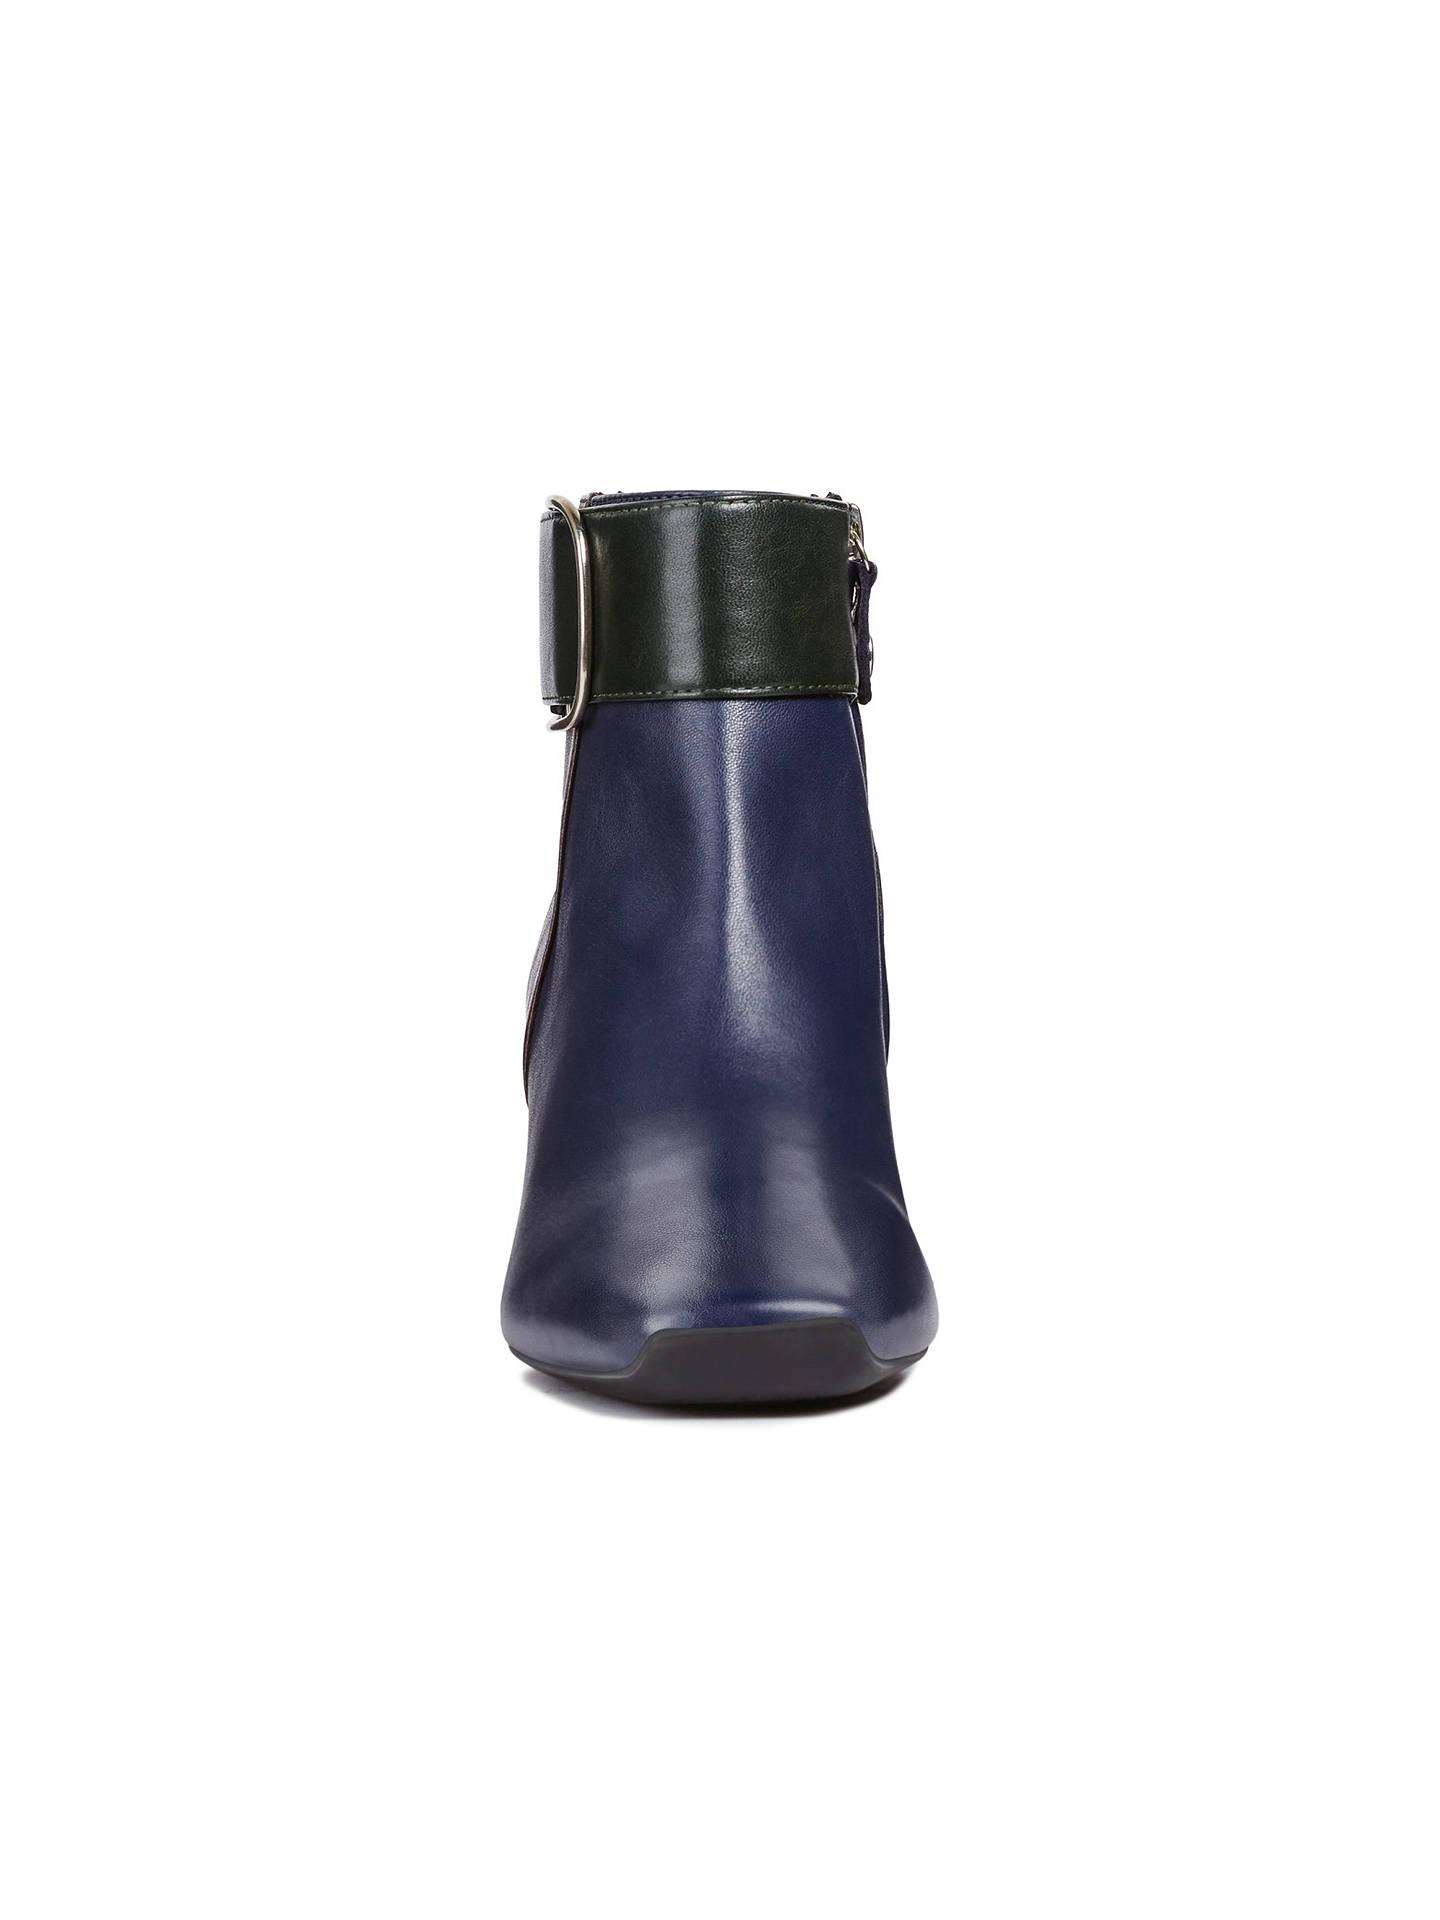 65a3bc5c32227 ... Buy Geox Women's Vivyanne Block Heel Ankle Boots, Blue/Multi Leather, 4  Online ...